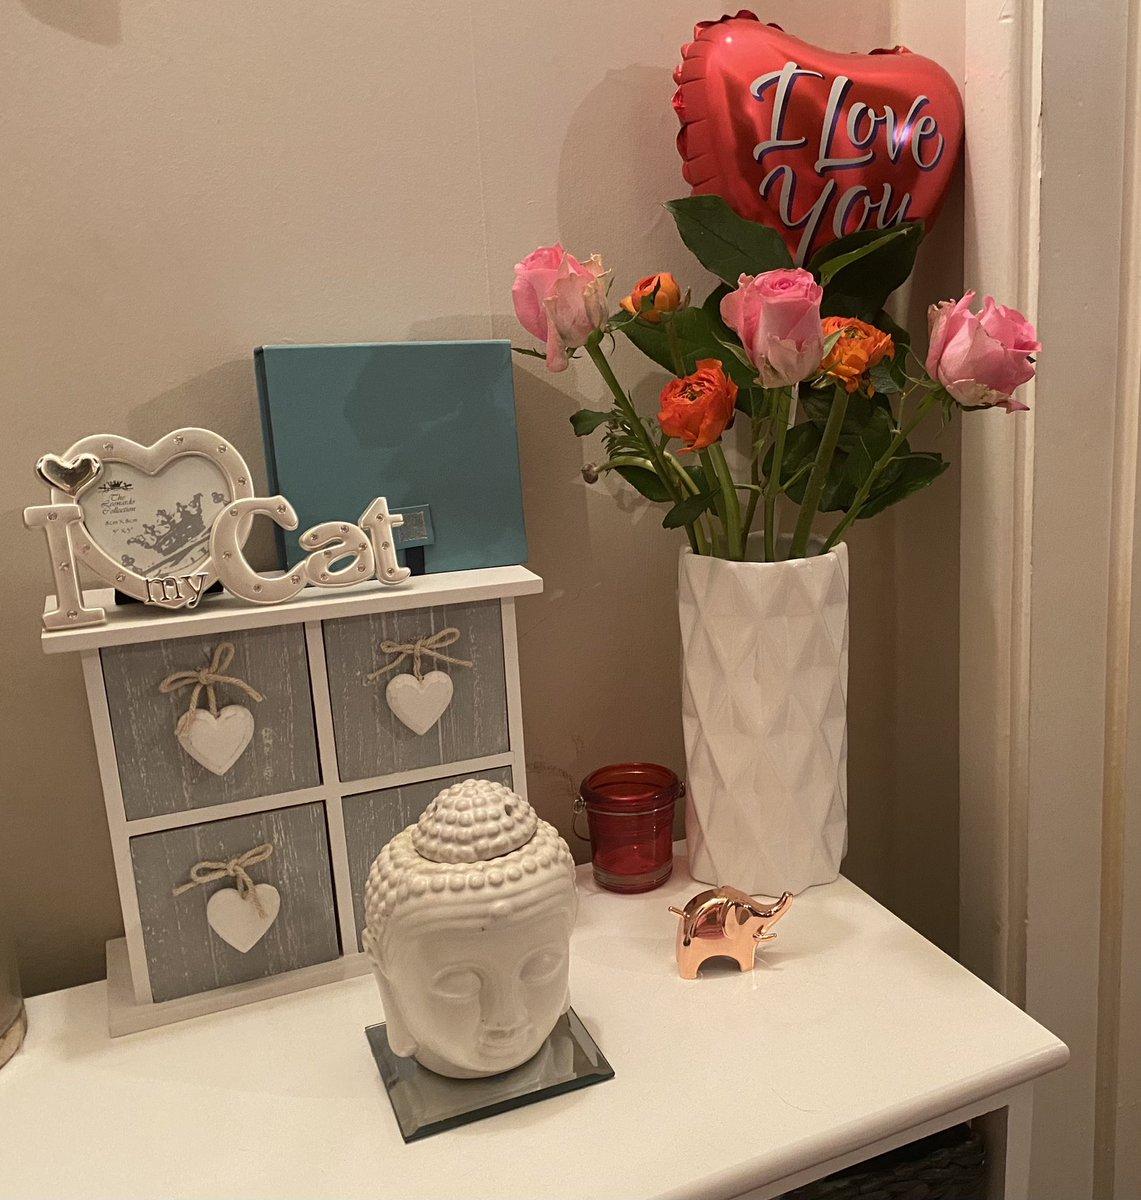 #surprise!!🌸 💐🌺  #surprisedelivery #bouquet #lovelovelove #fresh #flowers #roses #pretty #pink #prettyinpink #spoilt #loveit #MJsWorld🤷🏻♀️  💐🙆🏻♀️🌸❤️